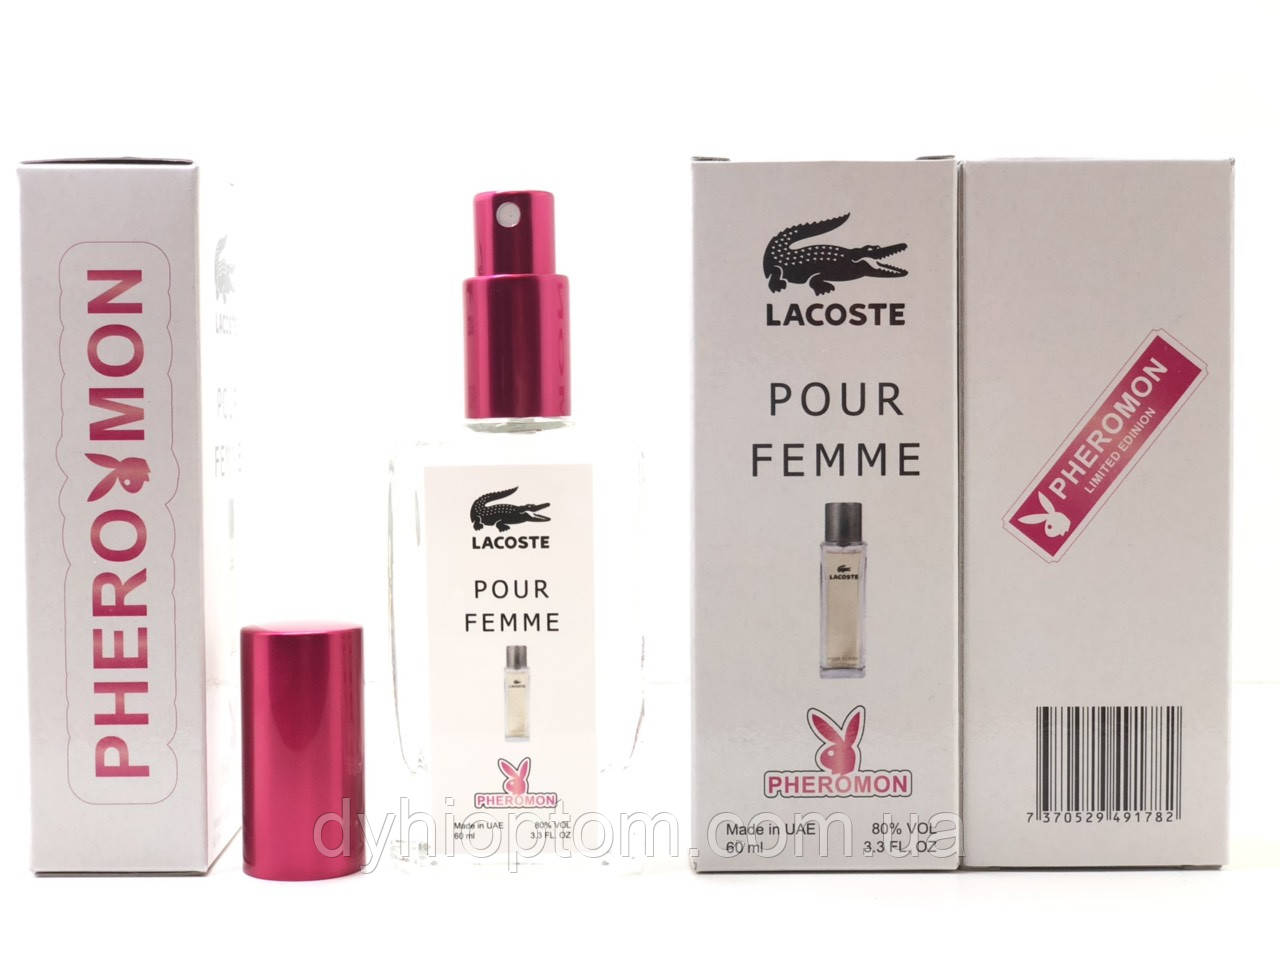 Женский парфюм Lacoste Pour Femme, 60 ml